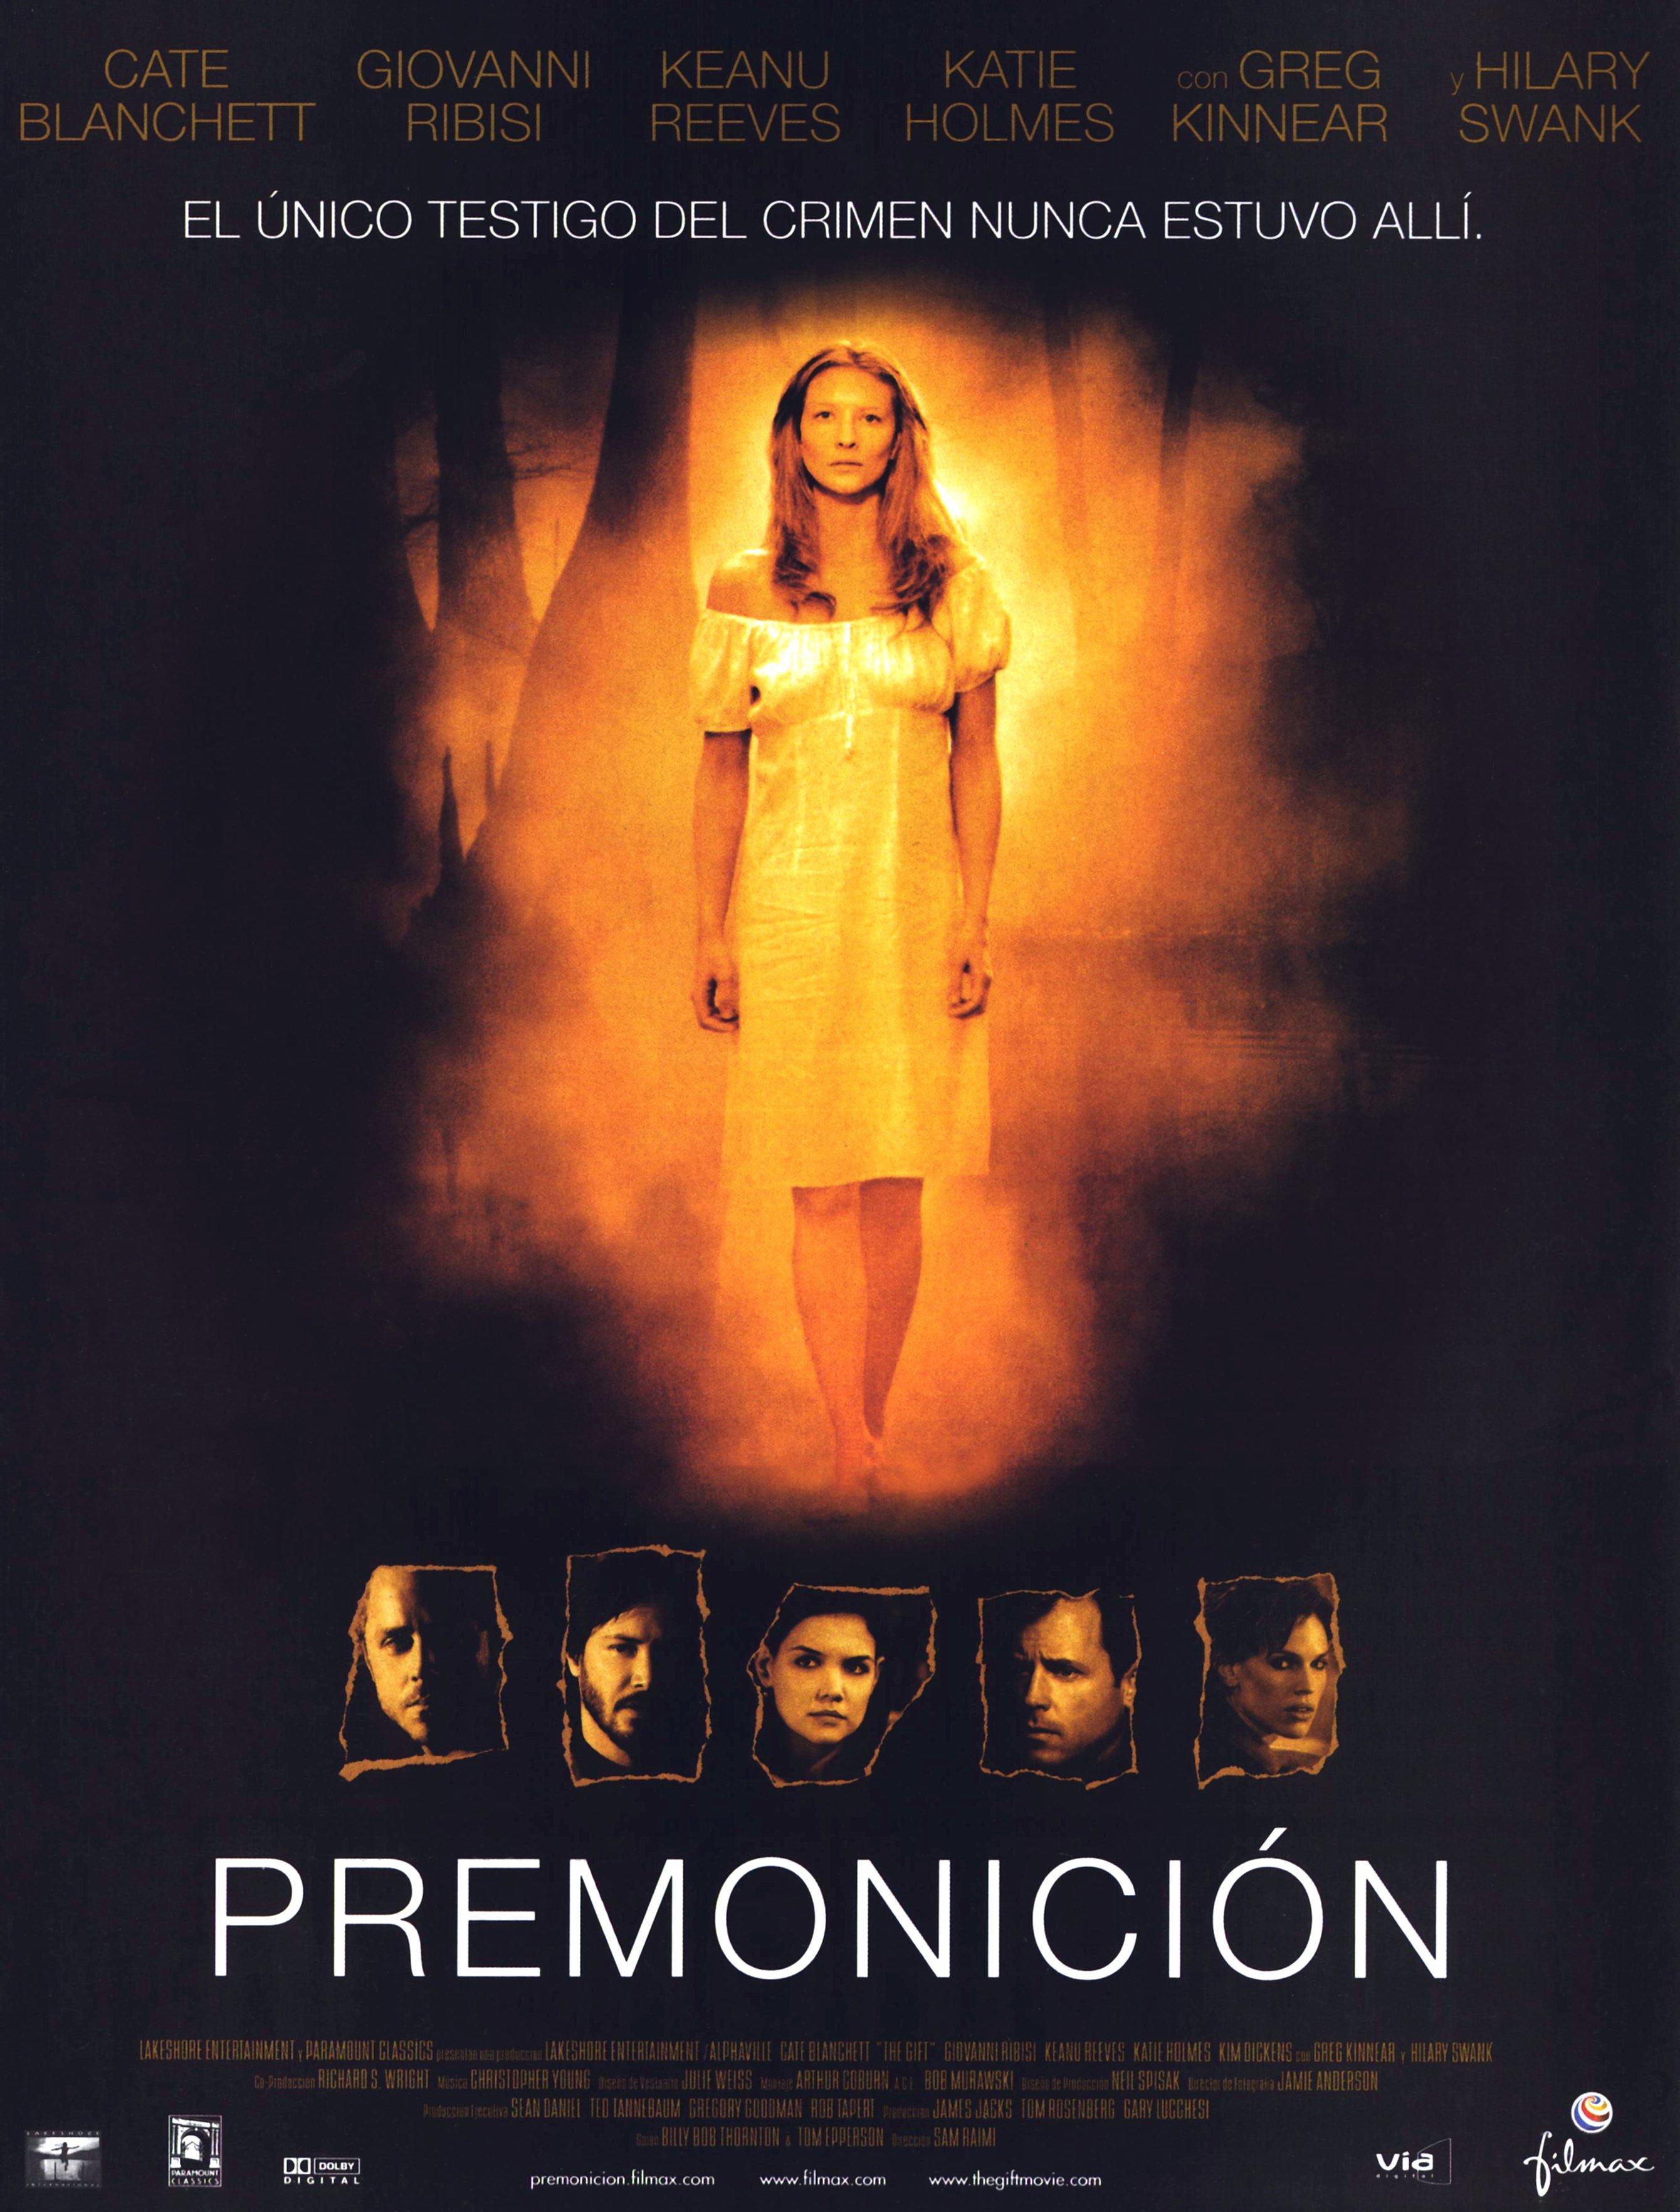 2000 The gift - Premonicion (esp) 01.jpg